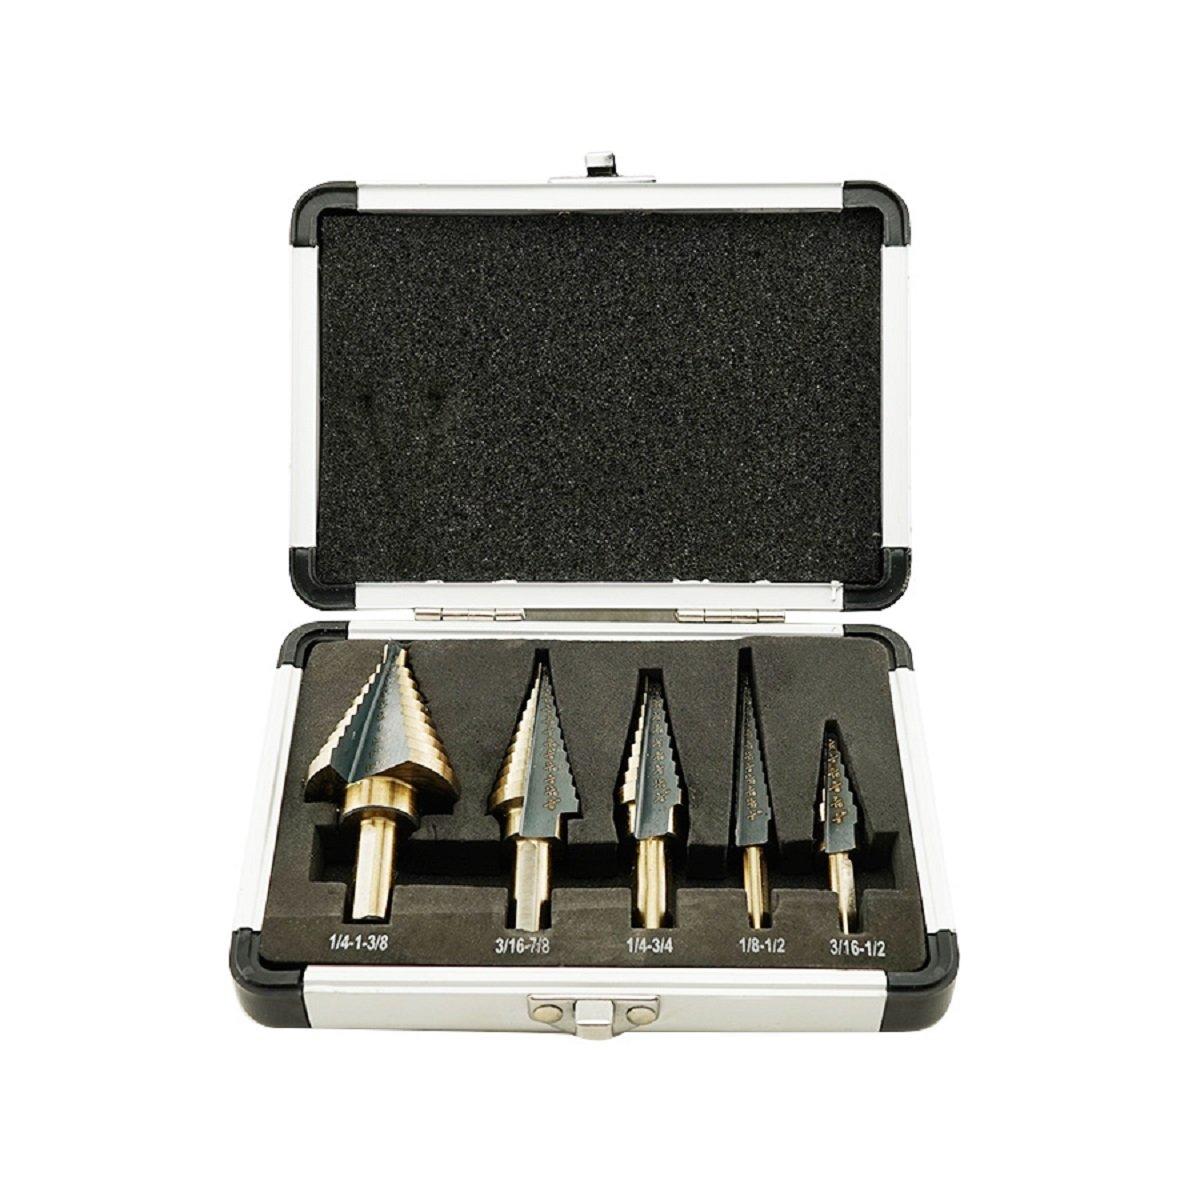 ixaer HSS Drill Bit-5PCS HSS COBALT MULTIPLE HOLE 50 Sizes STEP DRILL BIT SET w/ Aluminum Case